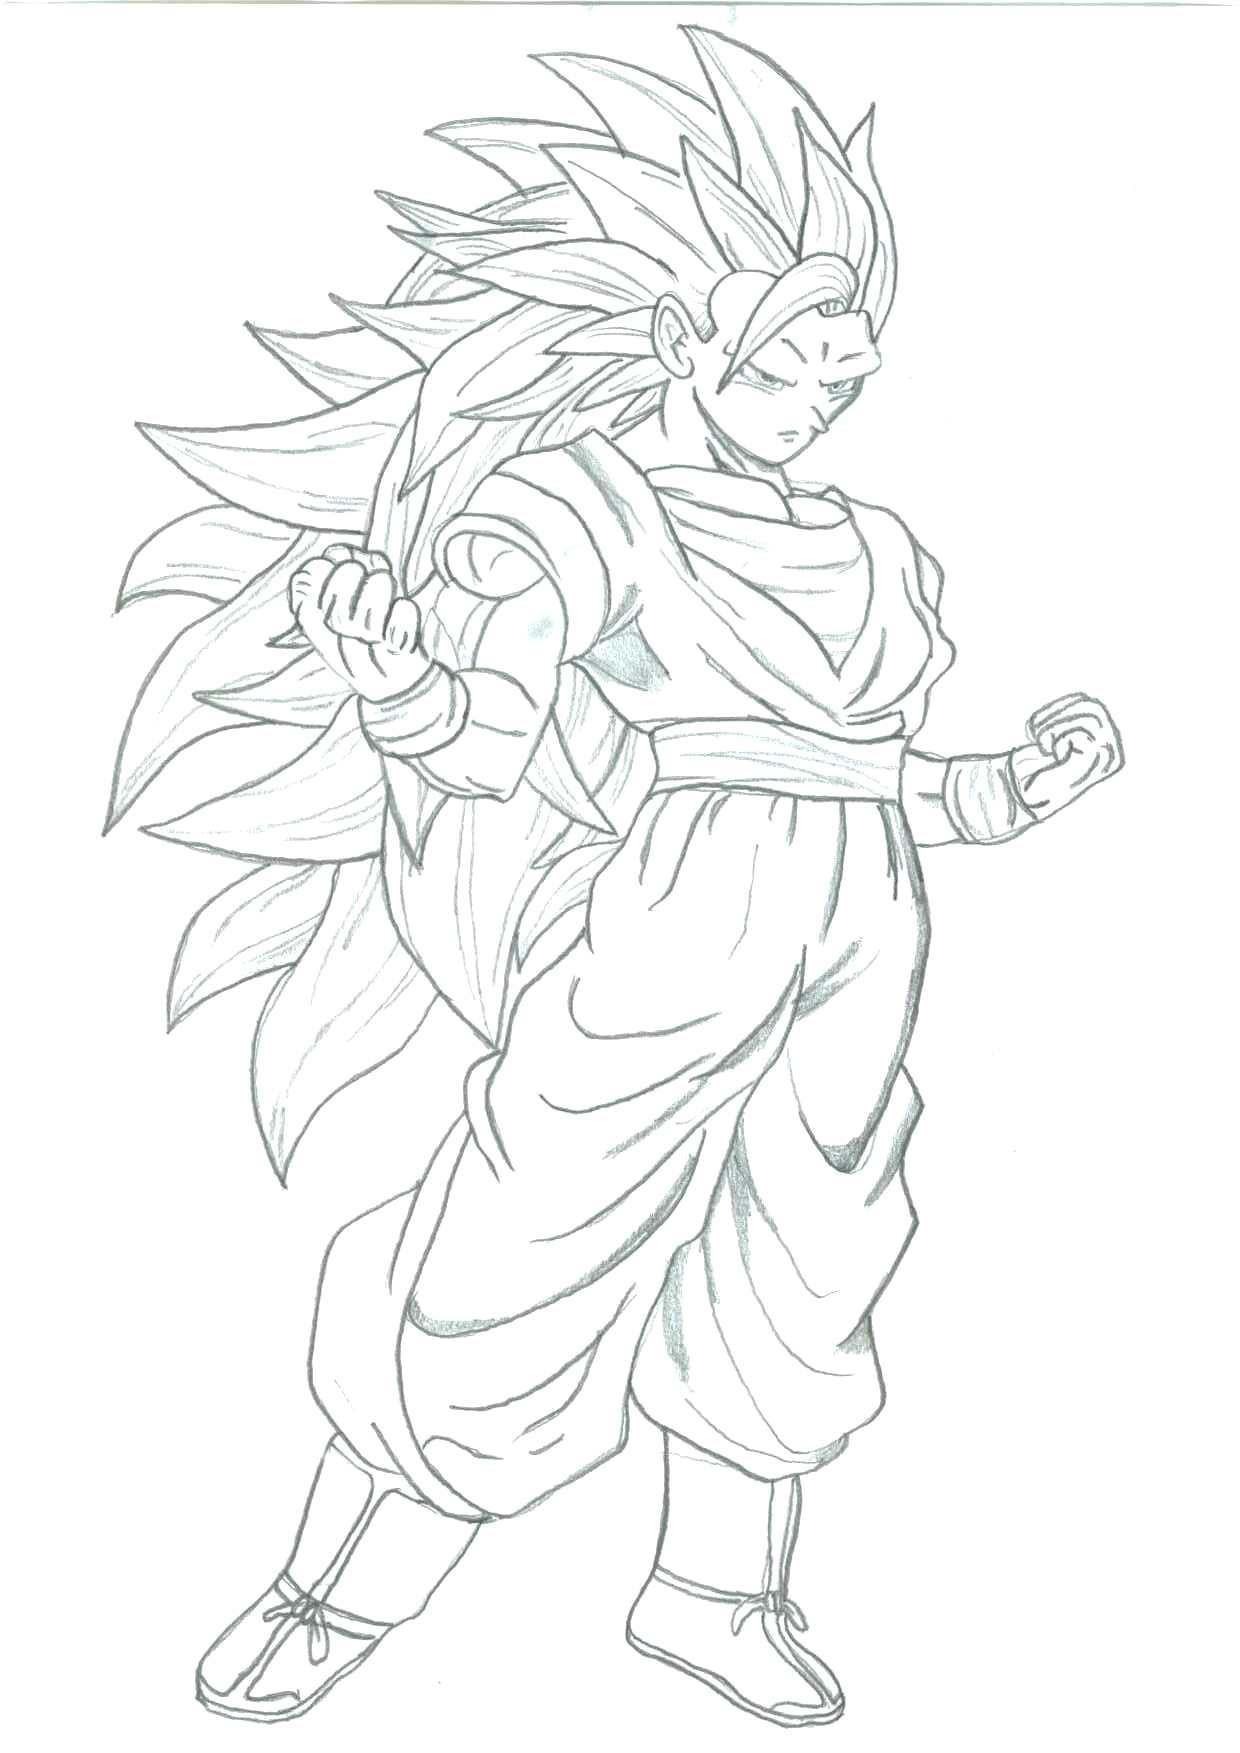 Goku Super Saiyan 3 Coloring Pages At Getdrawings Com Free